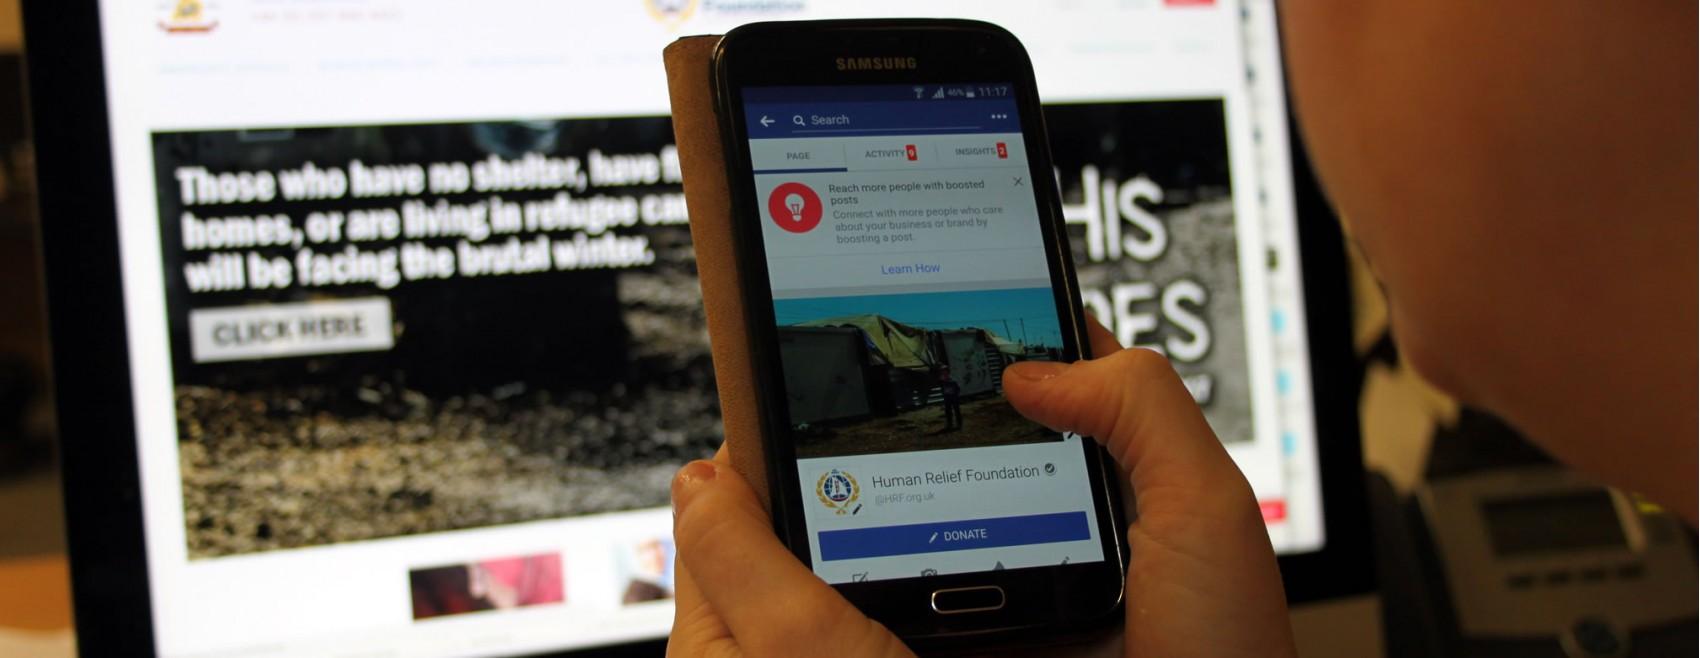 Social media Human Relief Foundation